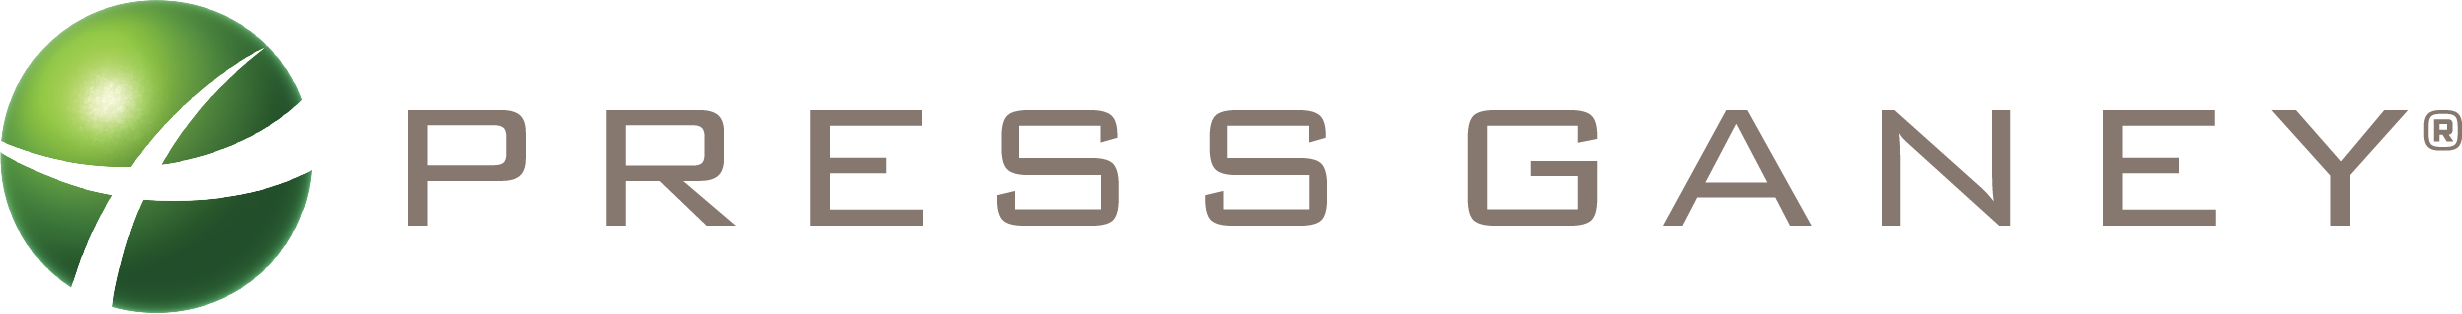 Press Ganey Holdings logo